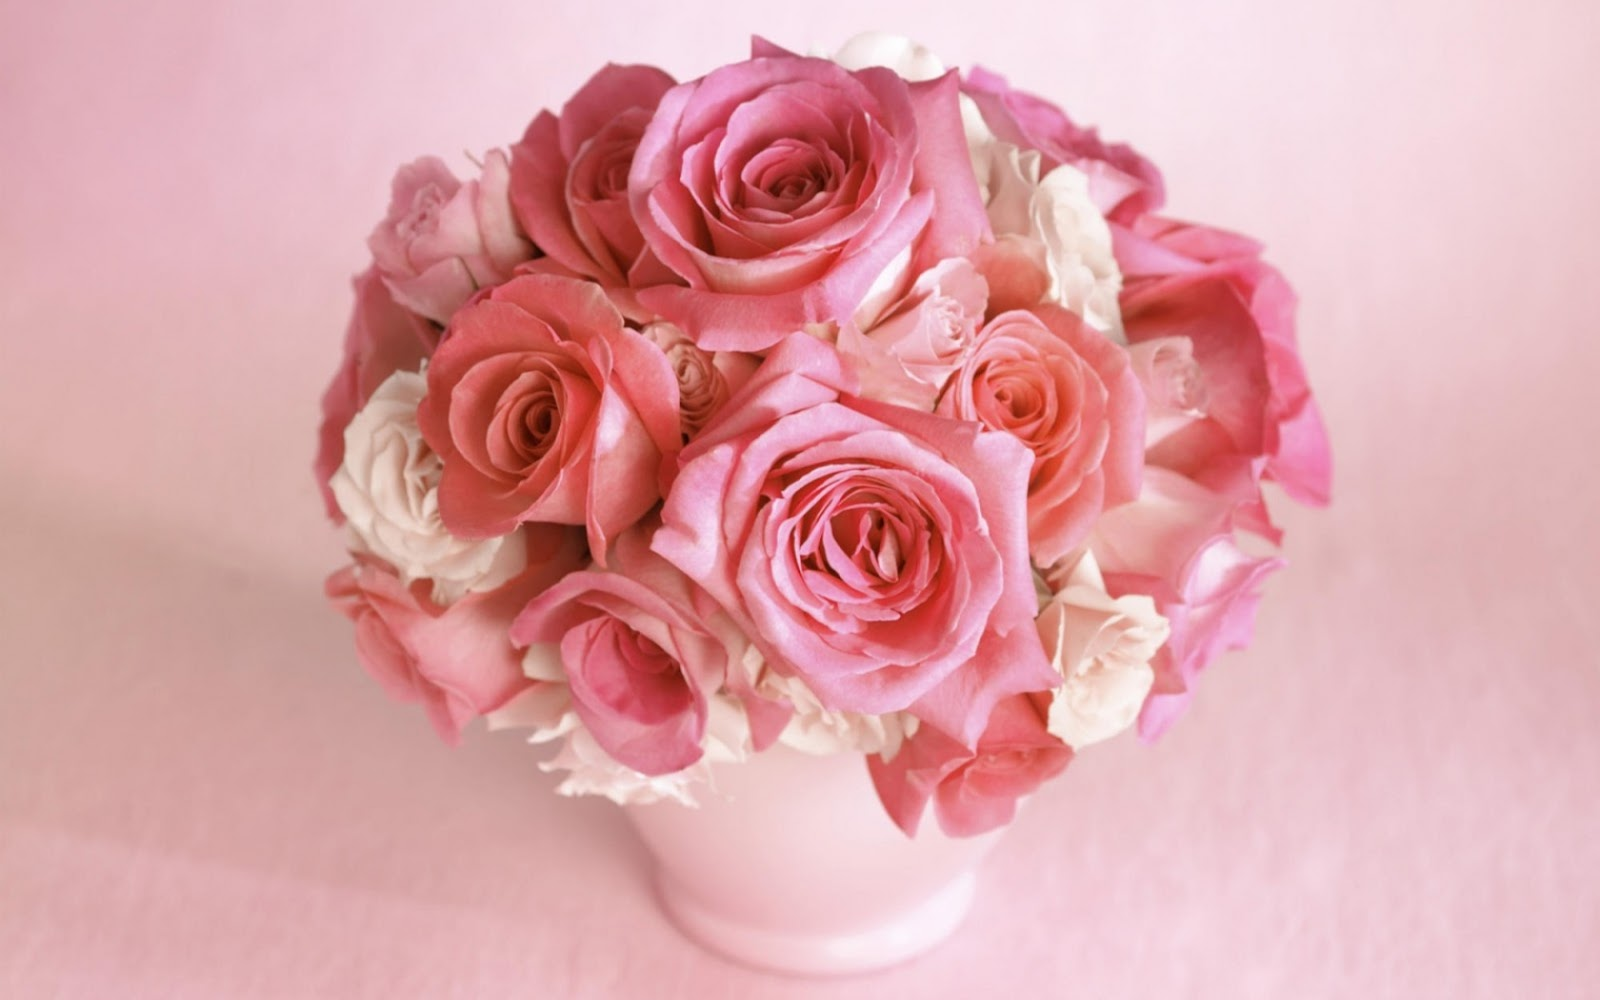 http://2.bp.blogspot.com/-GPHwYG2NF_4/T0v6lnAKViI/AAAAAAAAAu8/UX1Utn4xuJ8/s1600/Pink_Roses_Bouquet_Pink_Mud_Vase_HD_Wallpaper.jpg